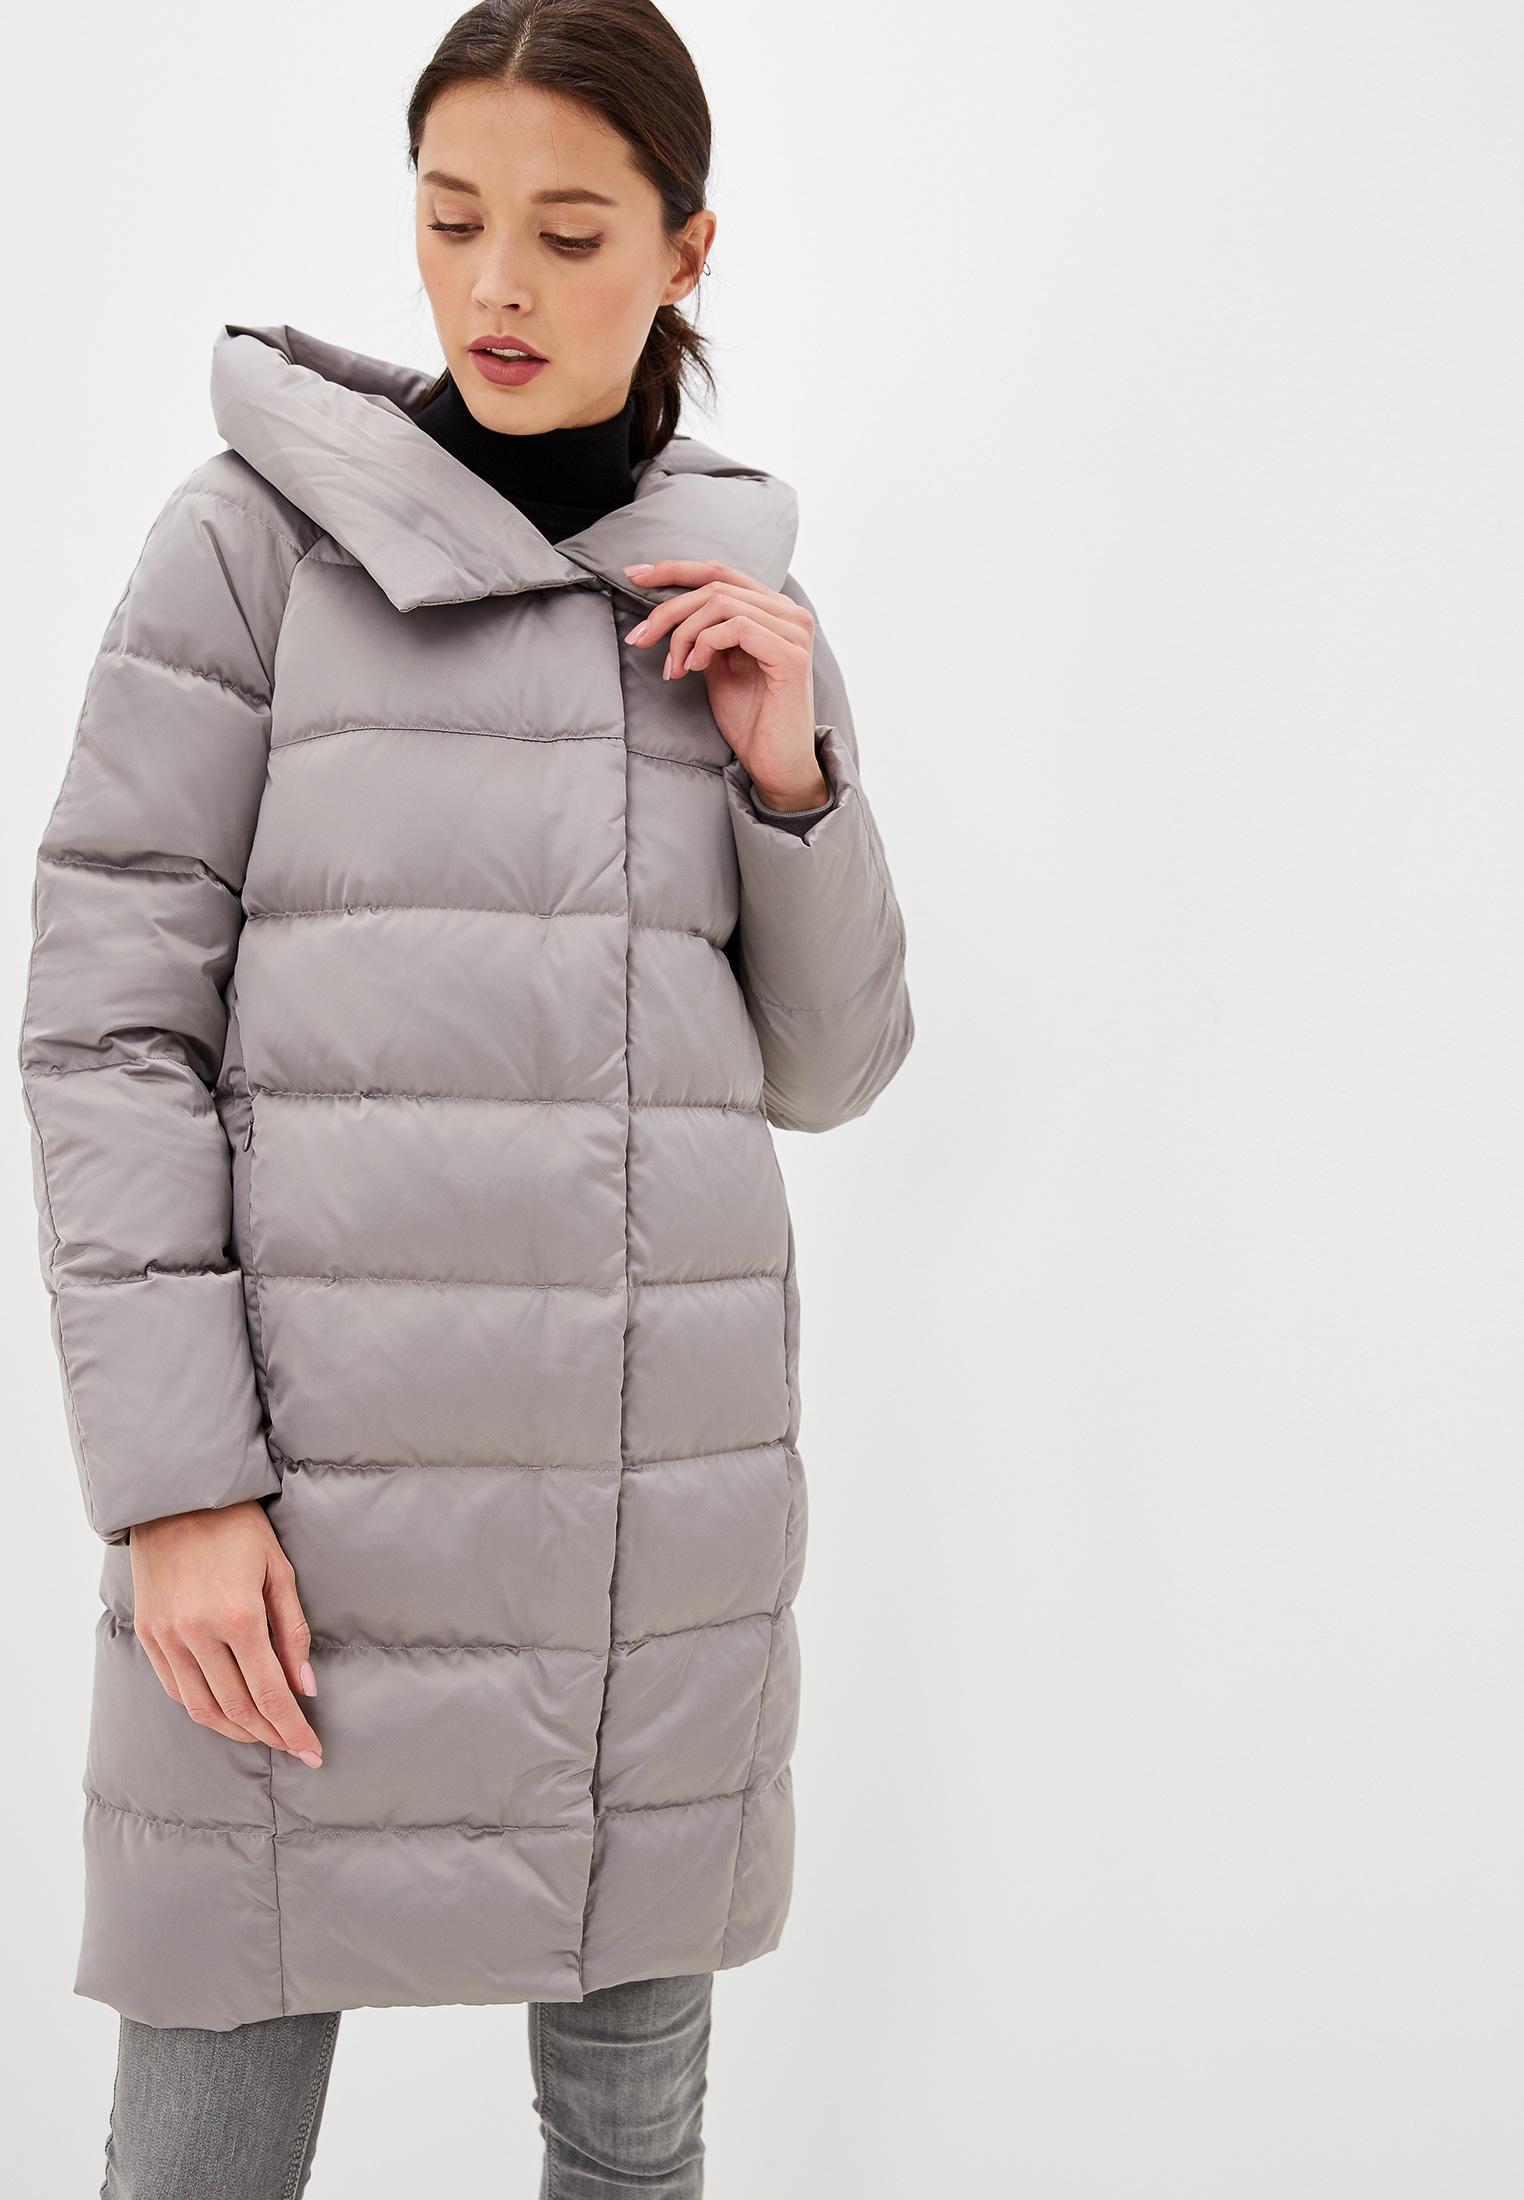 Пуховик, Savage, цвет: серый. Артикул: SA004EWGESA7. Одежда / Верхняя одежда / Пуховики и зимние куртки